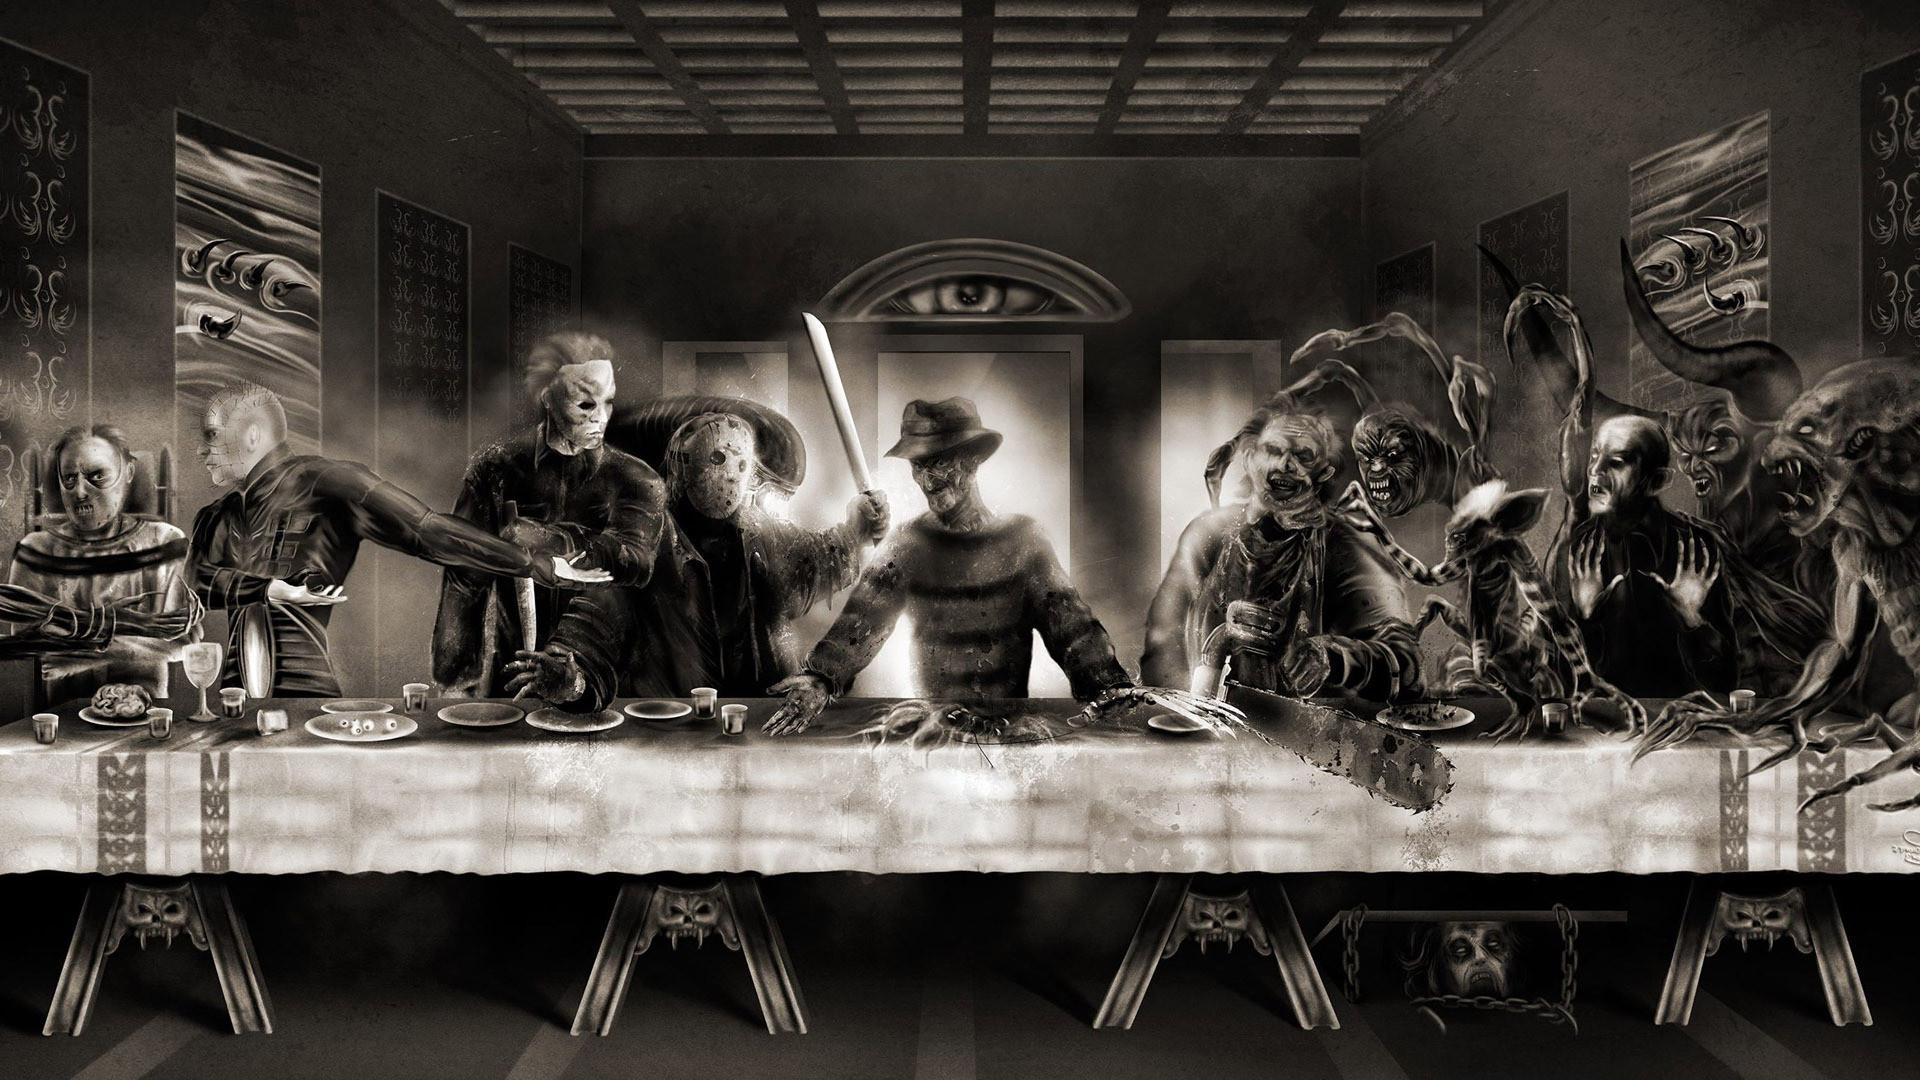 Res: 1920x1080, horror pictures | Horror Last Supper wallpaper - 1207184